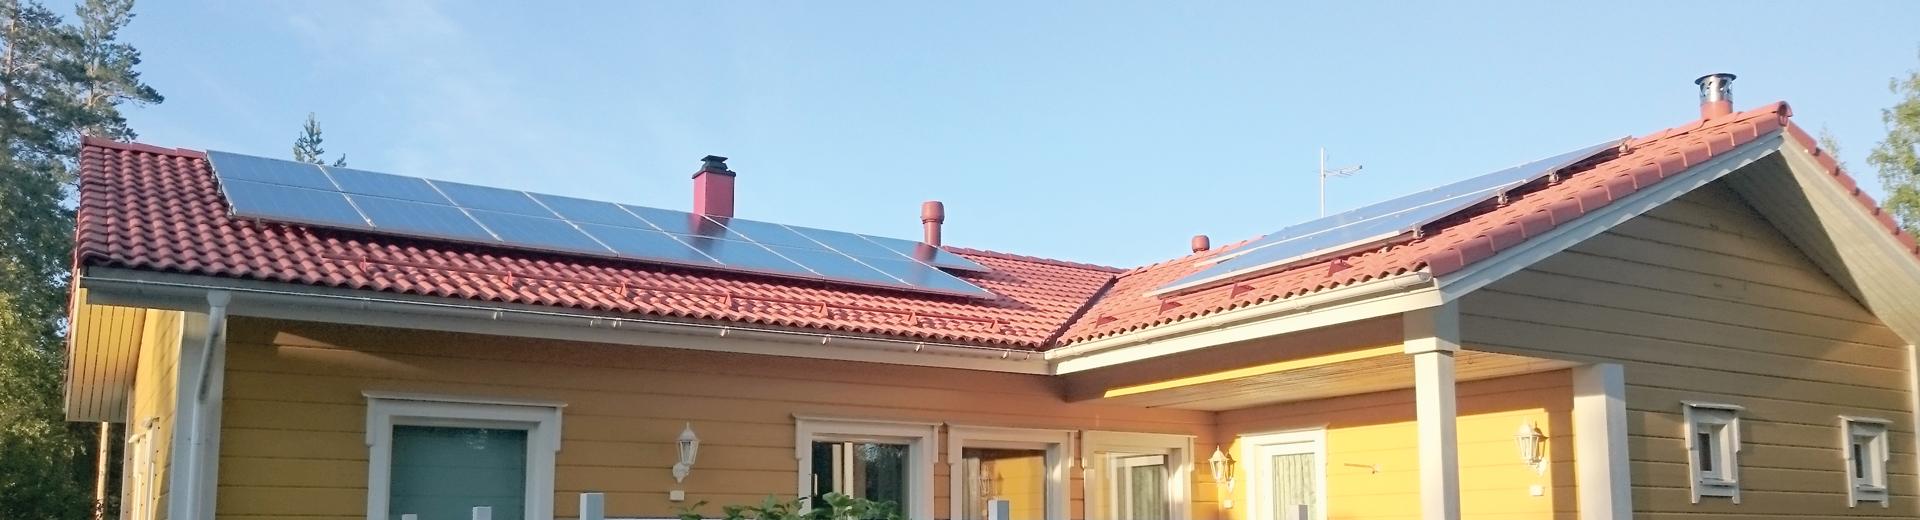 Finnwind | Aurinkopaneelit | Santander Rahoitus